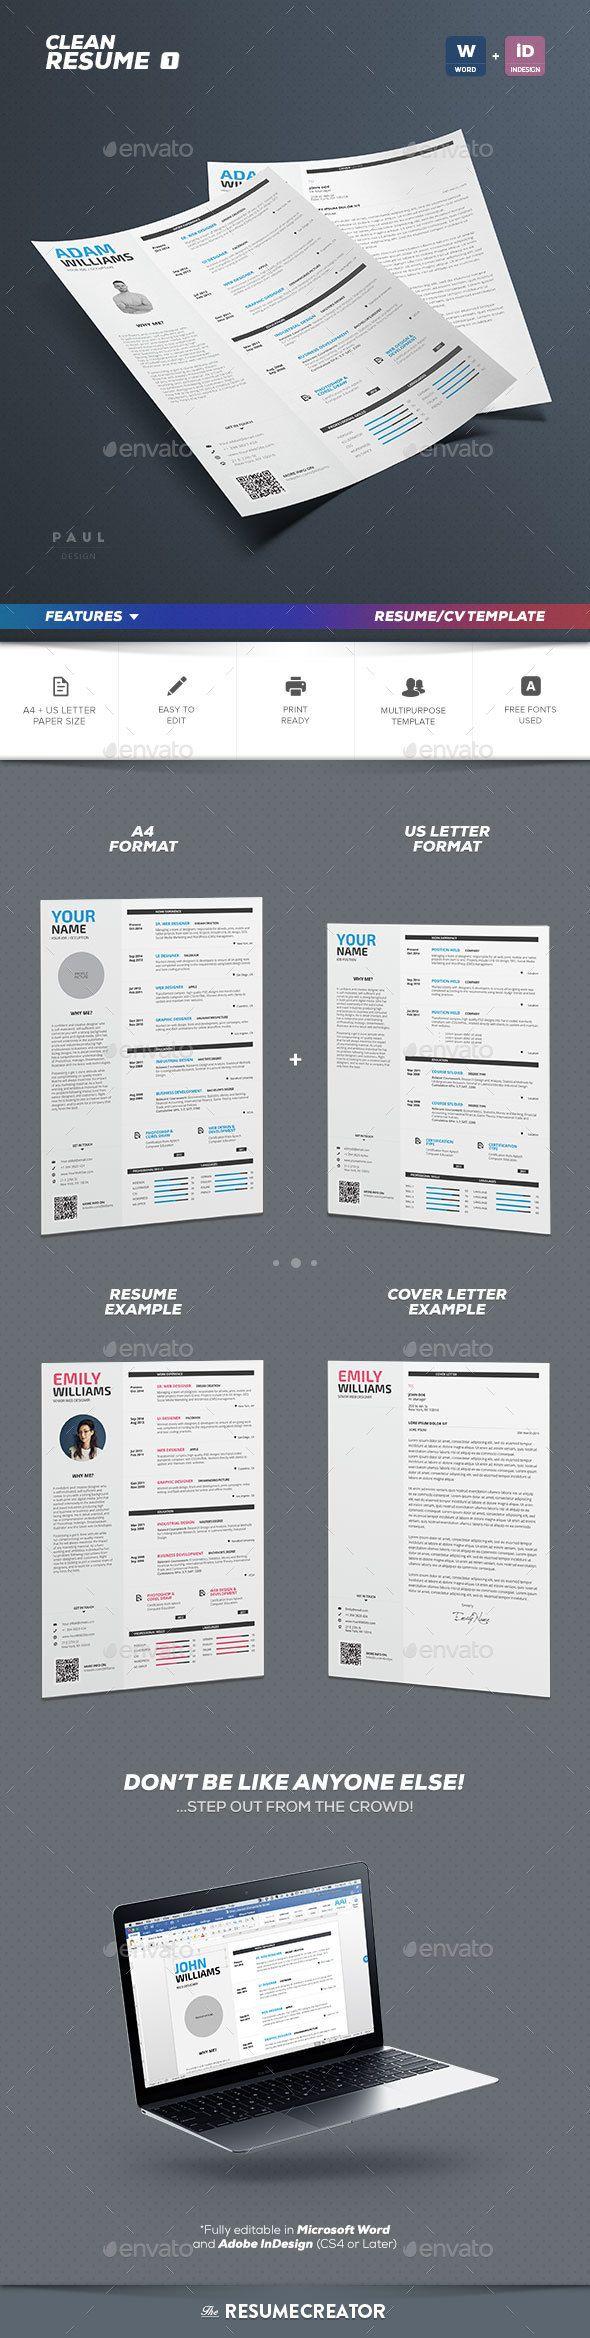 Clean Resume Vol1 1534 best Resume Design